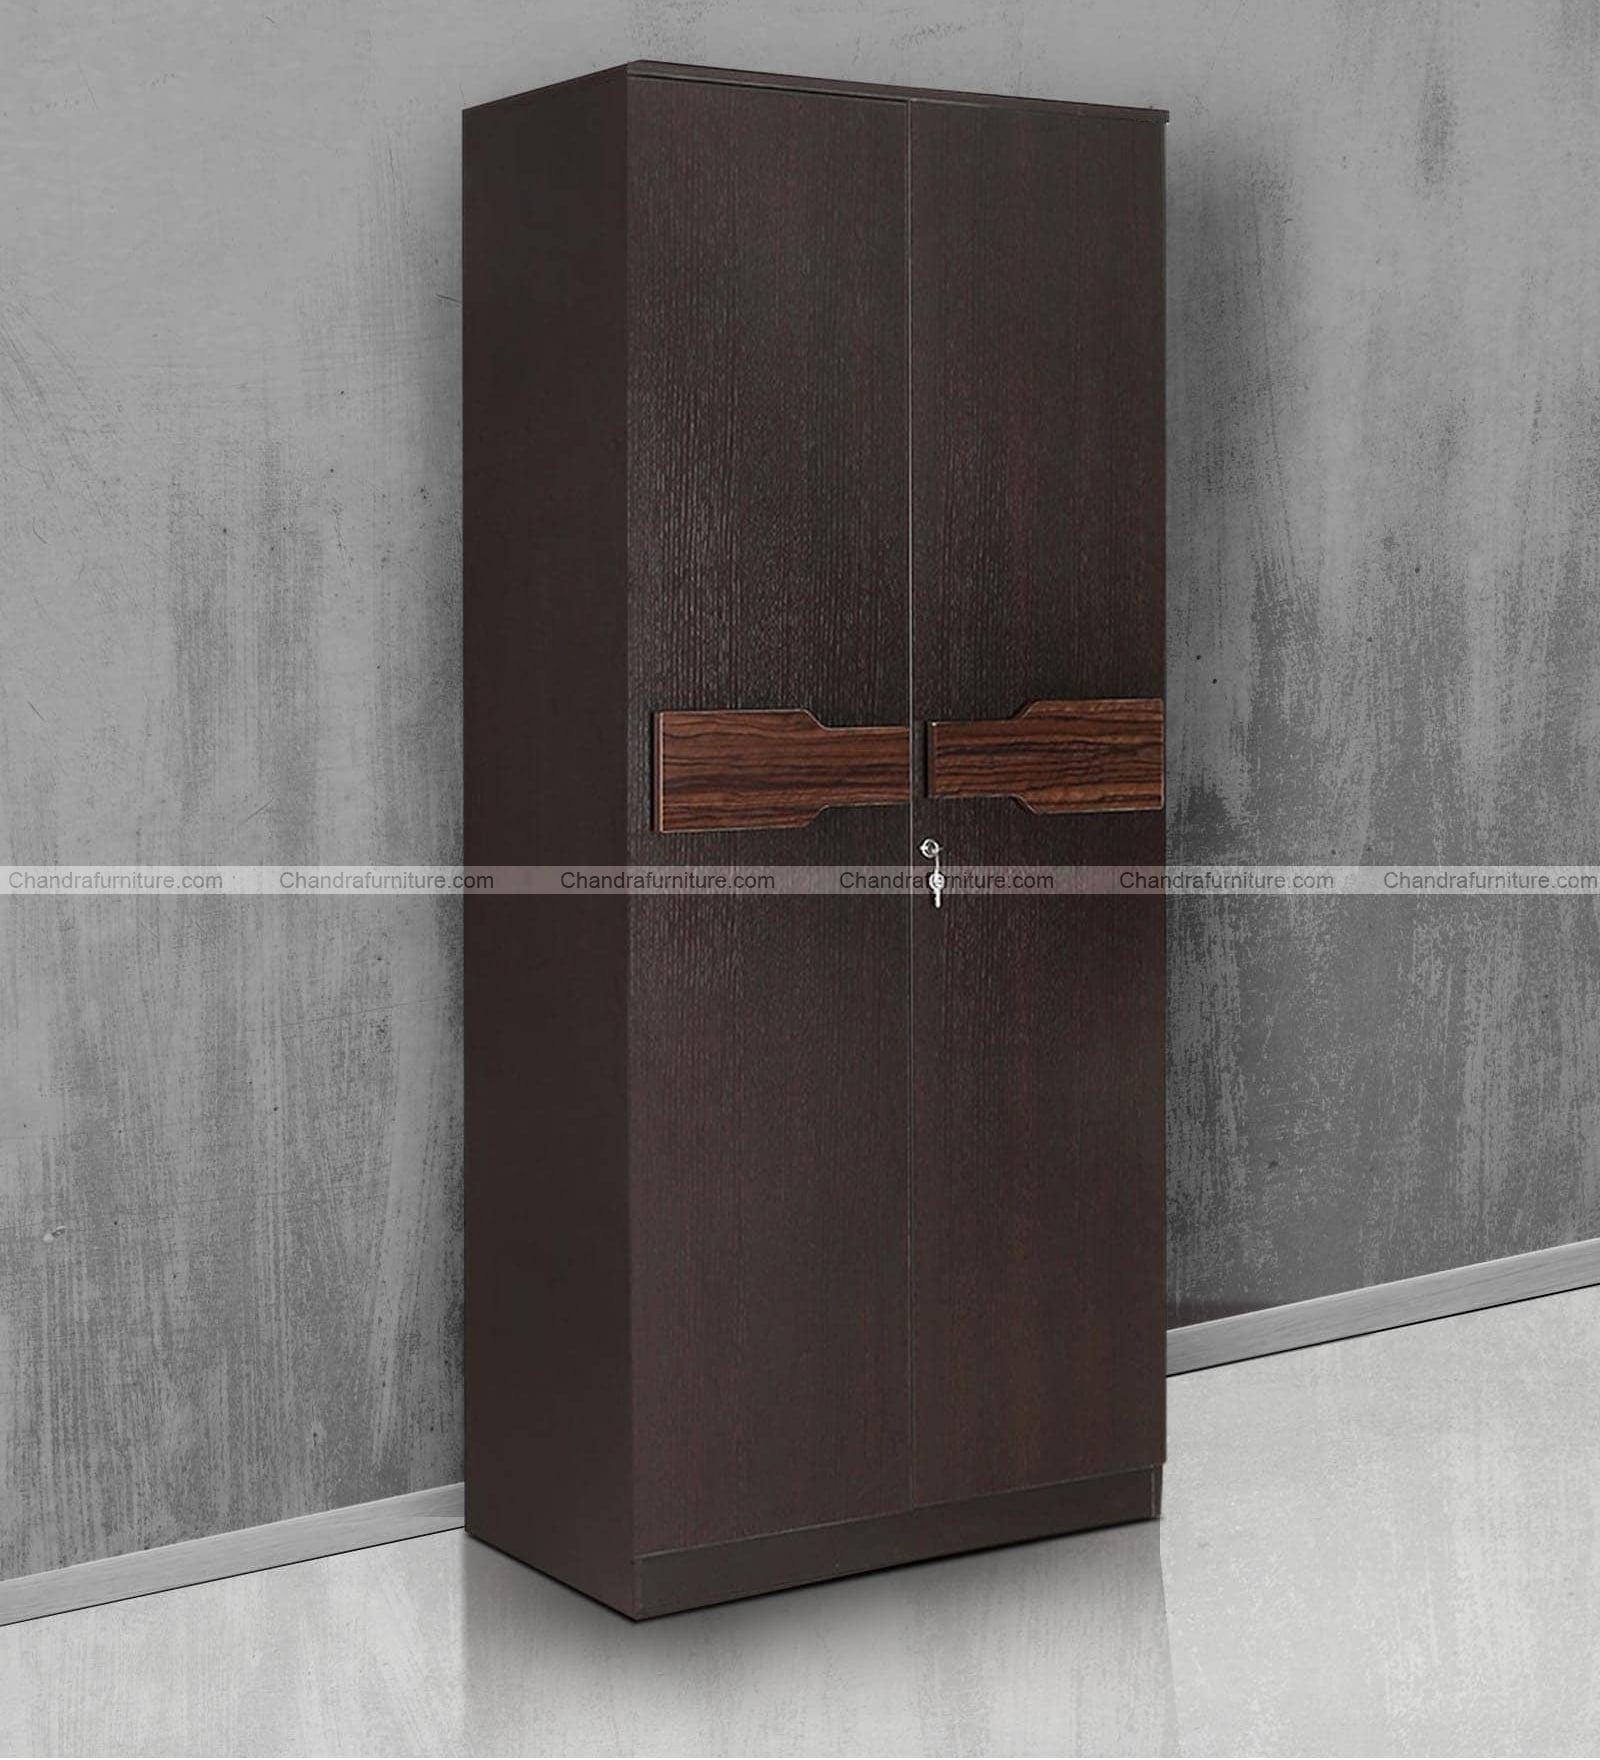 Chandra Furniture Duke  Two Door Wardrobe Dark Colour